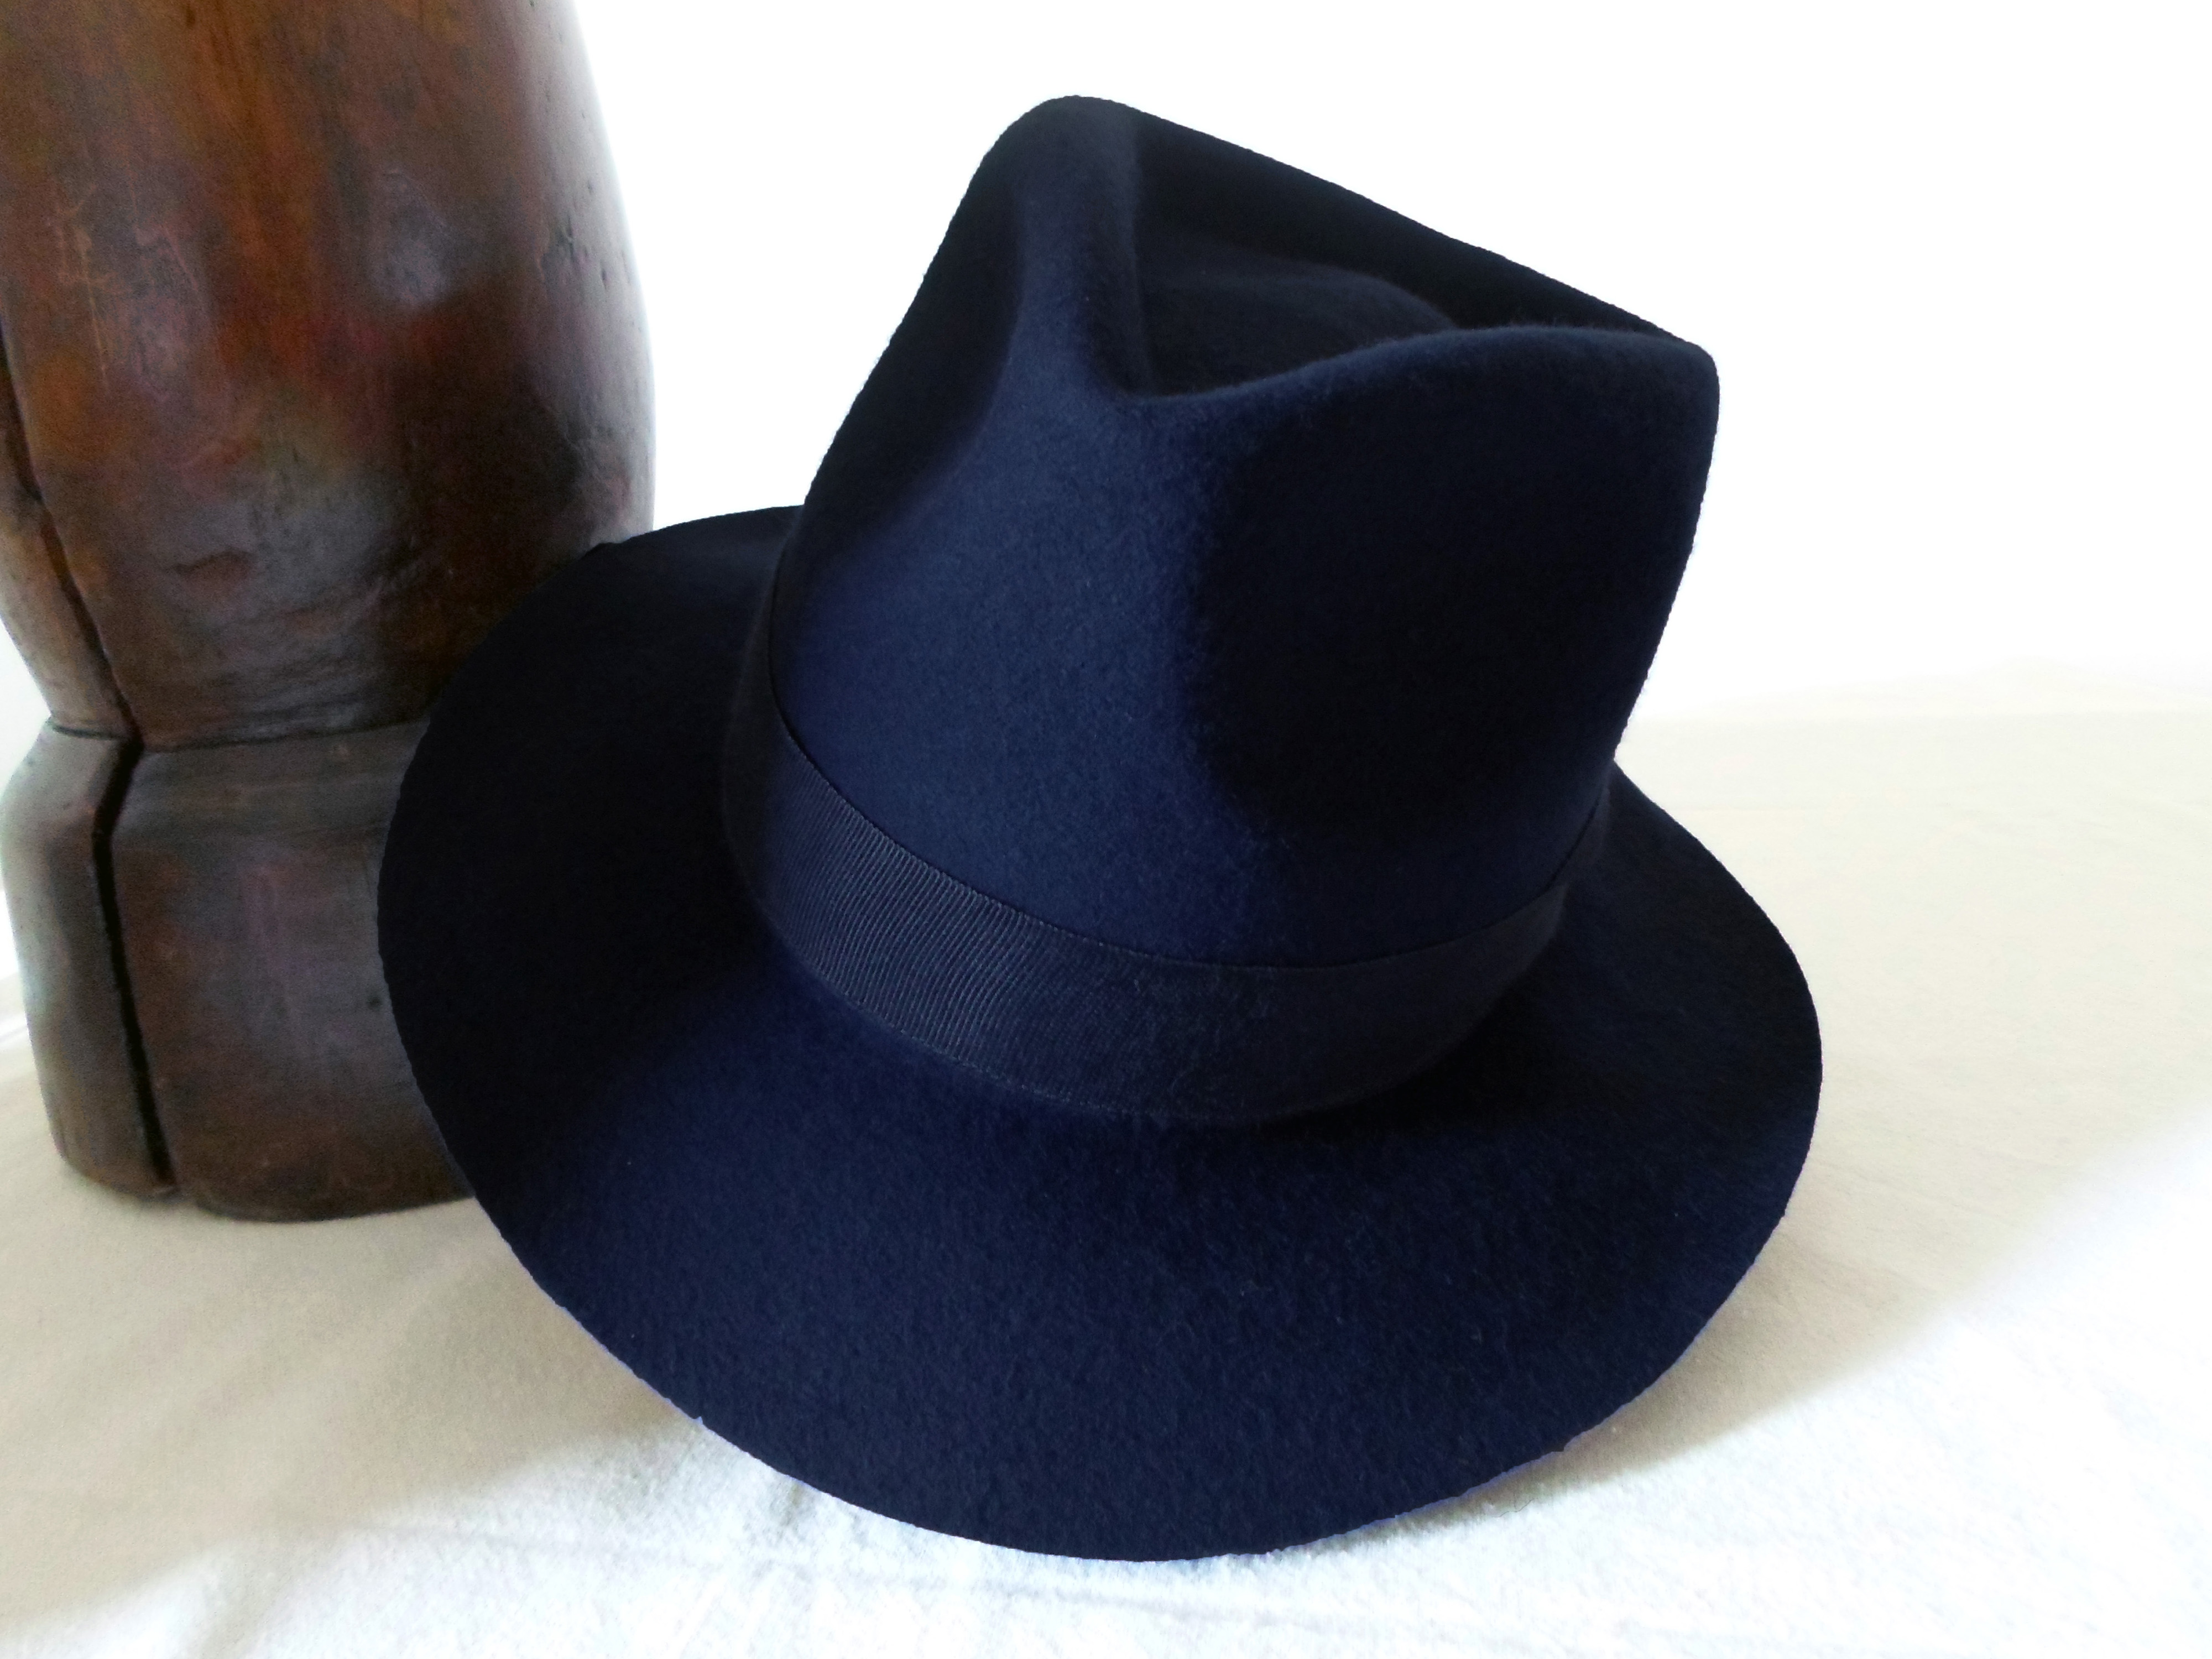 Navy Blue Wool Felt Fedora - Wide Brim Merino Wool Felt Handmade ... 3c27c0687